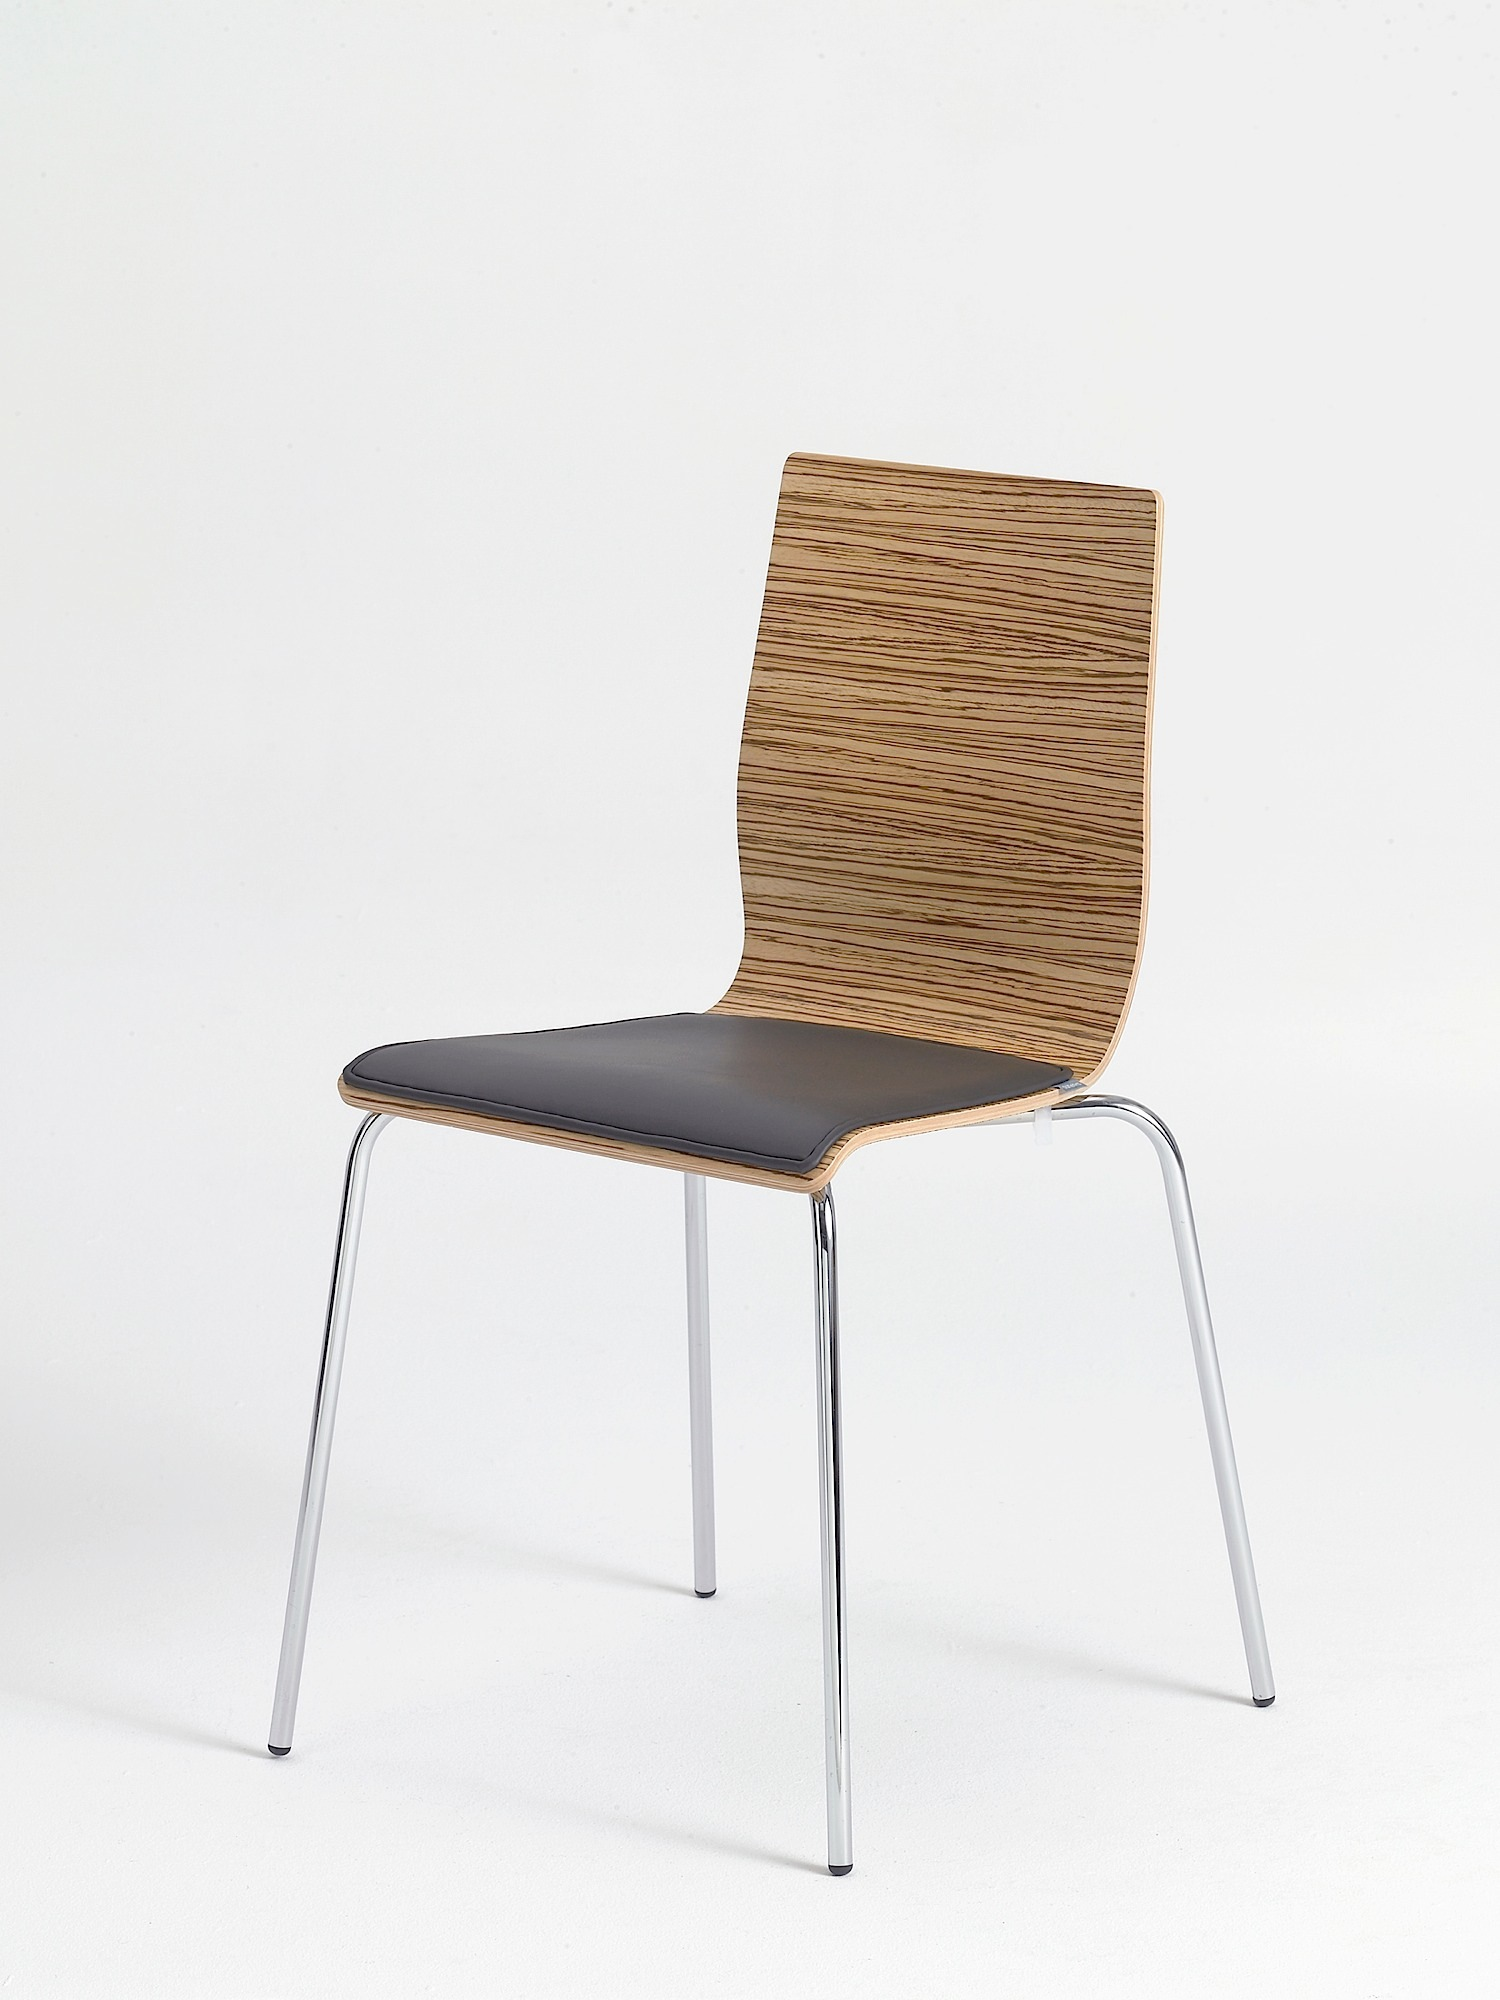 Anni_zebrano_upholster_seat.jpg